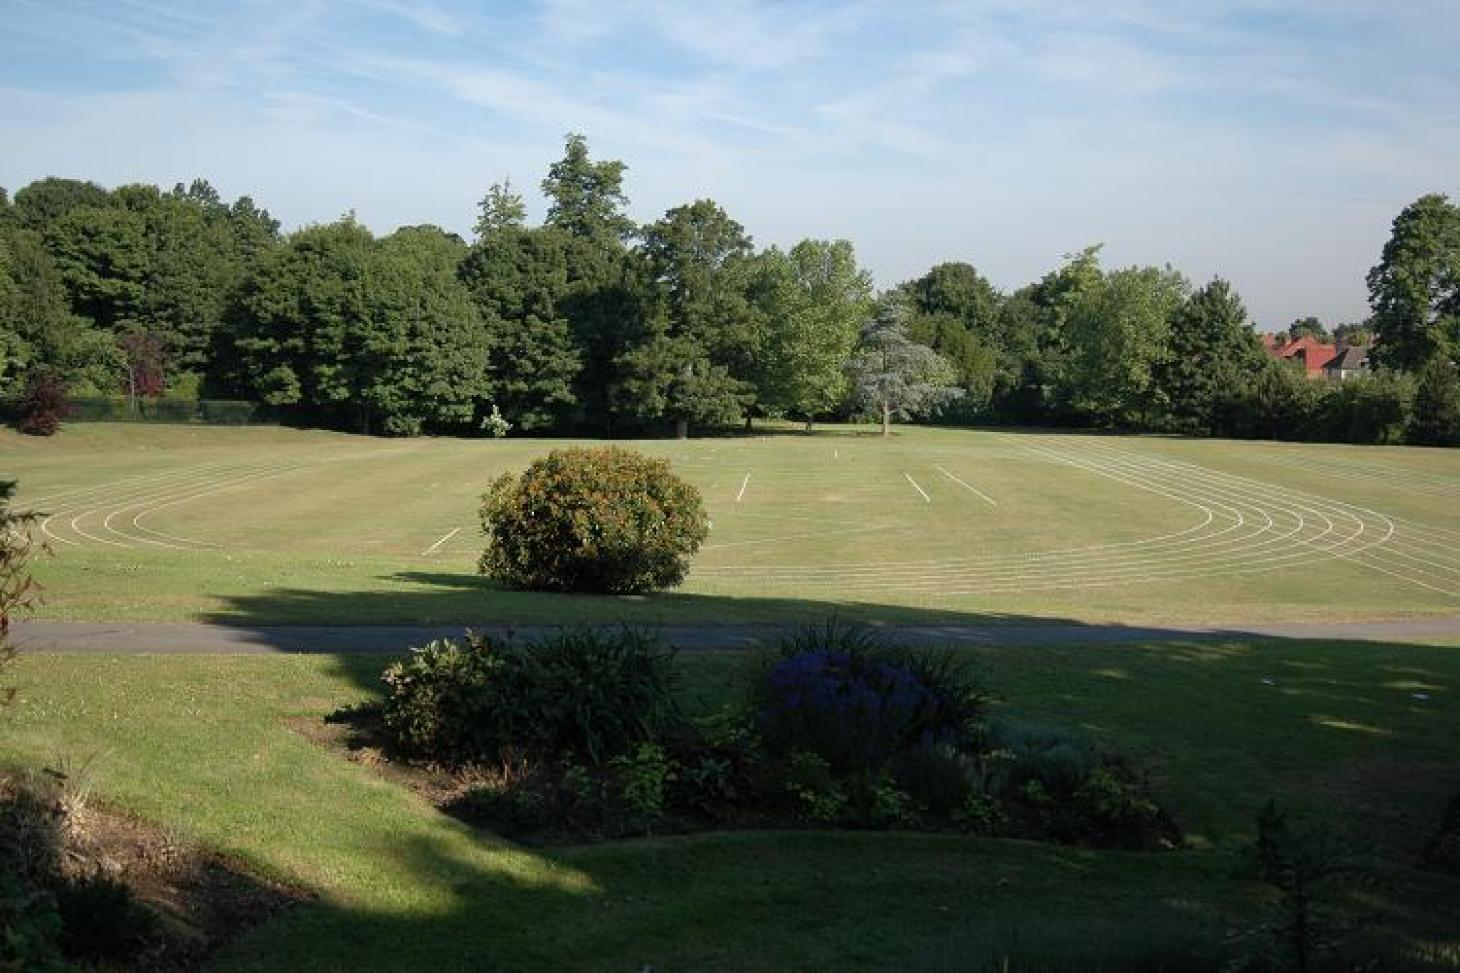 Croydon Sports Club Outdoor | Grass athletics track